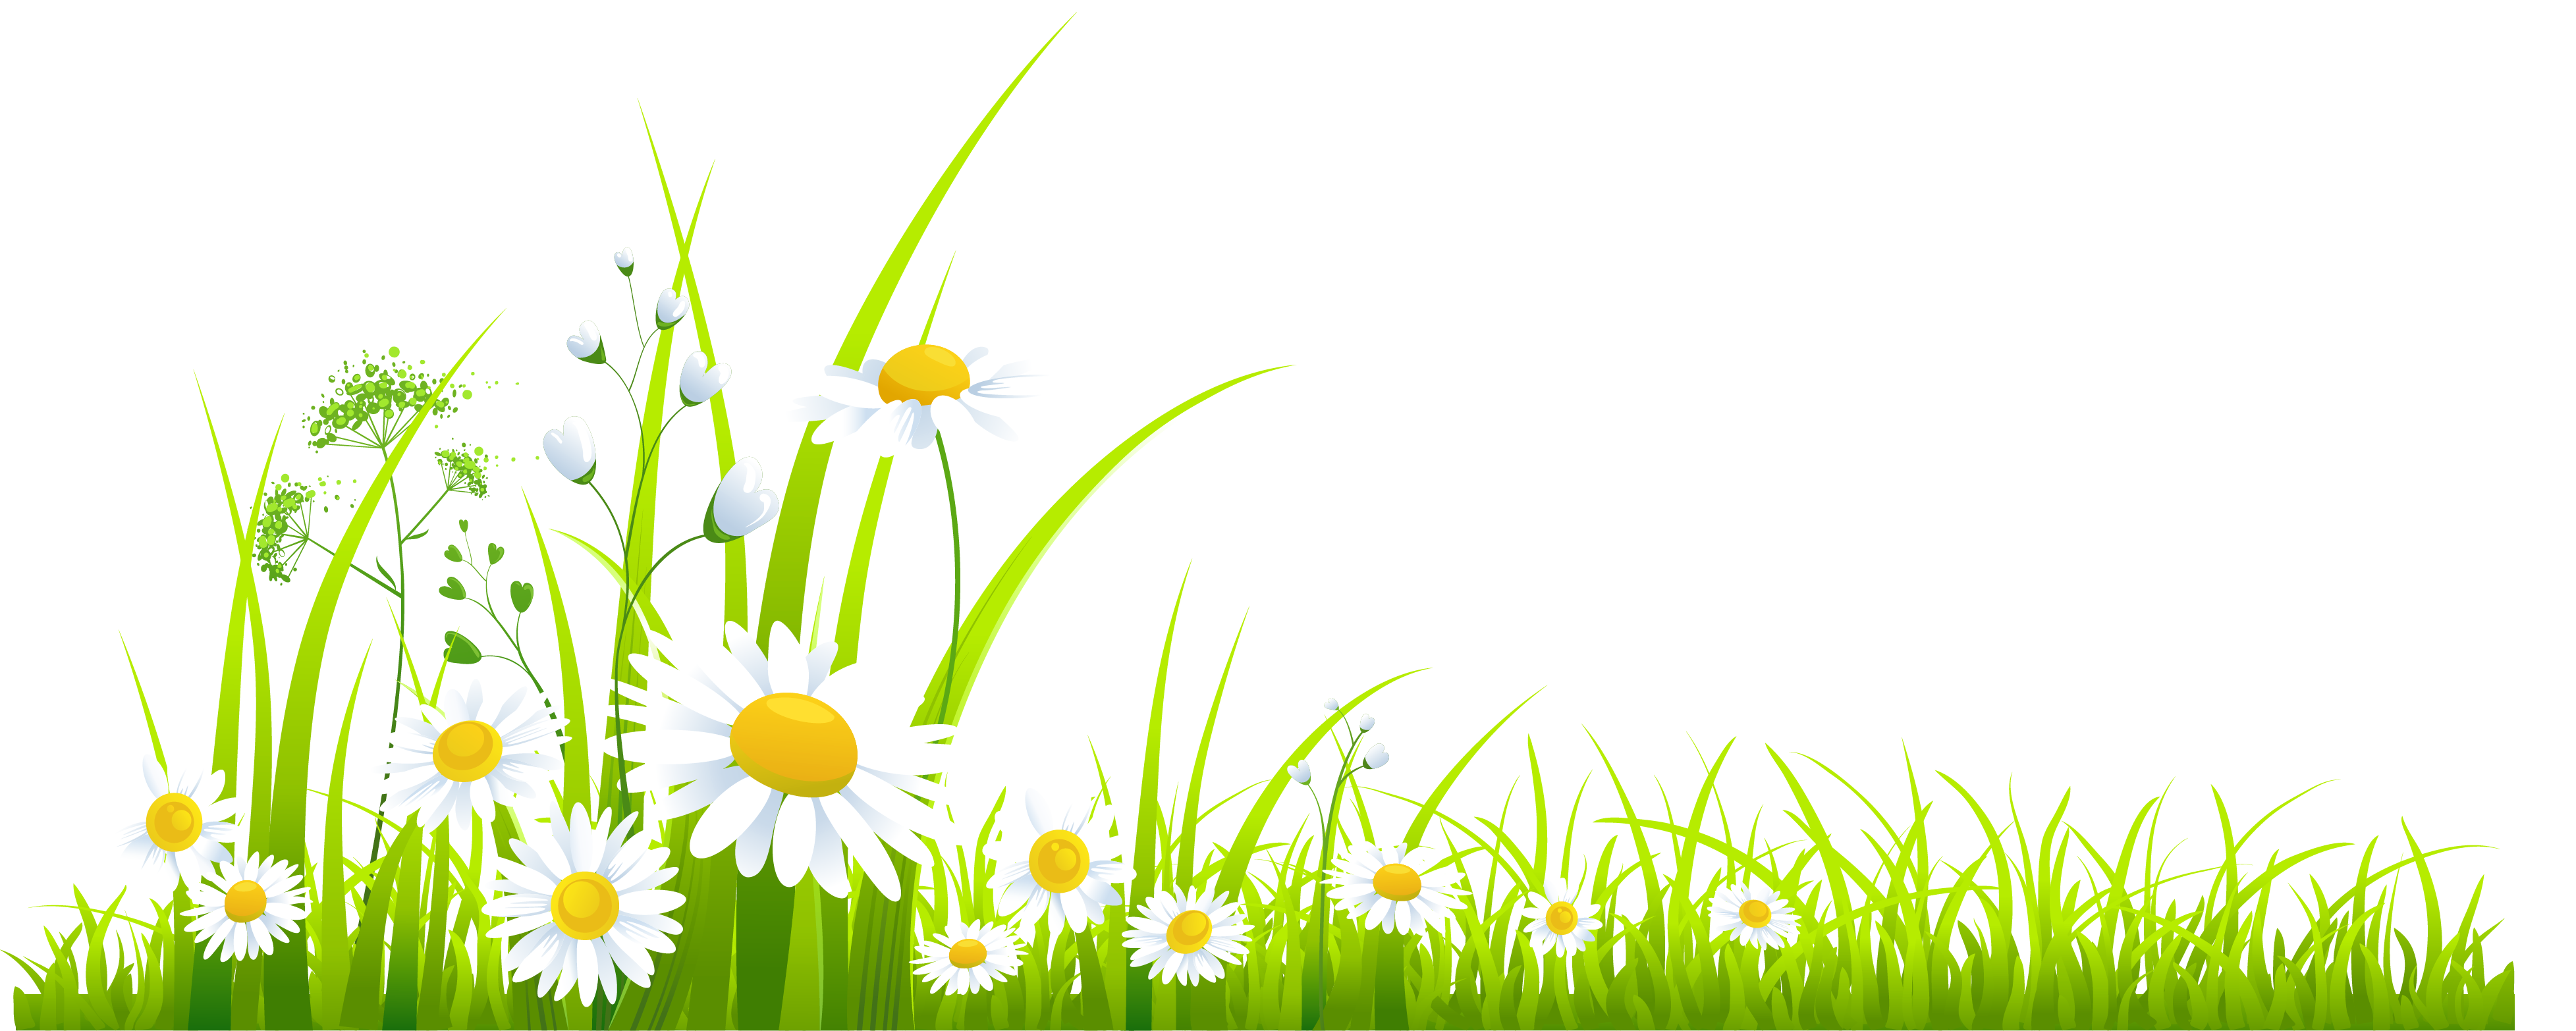 spring grass clipart flowers pinterest clipart images